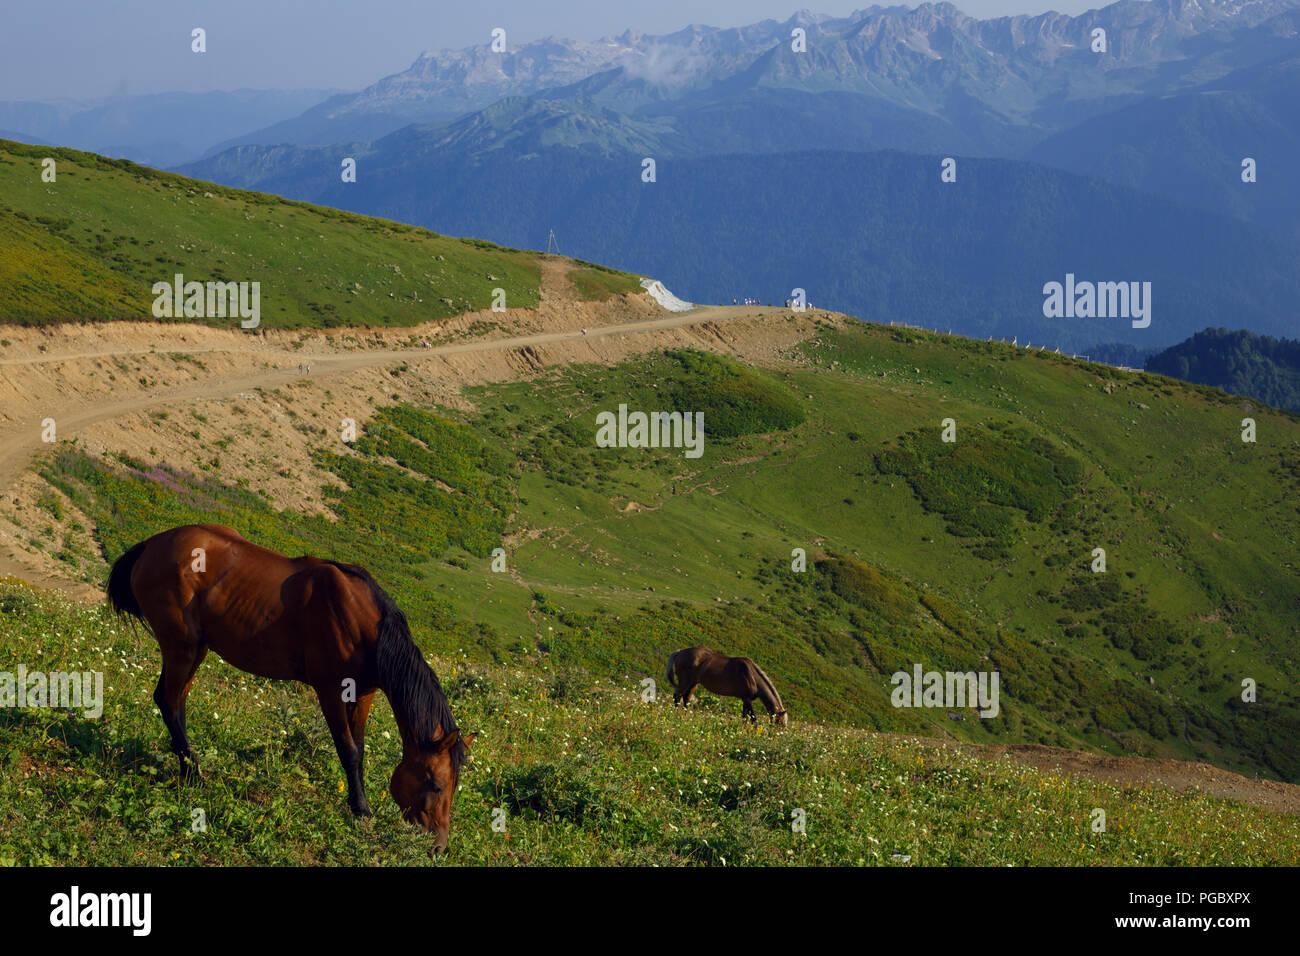 Grazing horses in the Caucasus mountains Sochi Russia Rosa Khutor, Krasnaya Glade Stock Photo